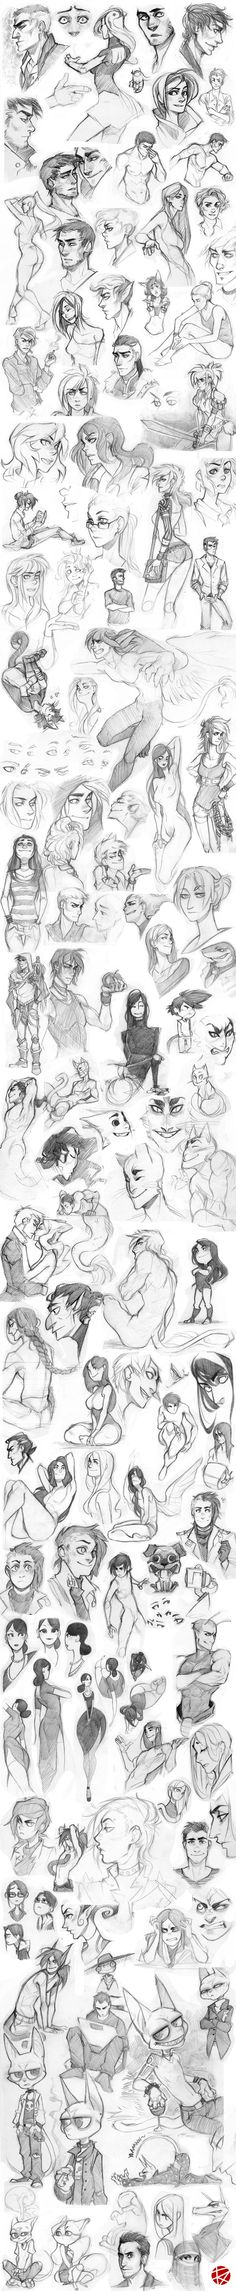 Sketch dump 01 by SylwiaPakulska.deviantart.com on @deviantART